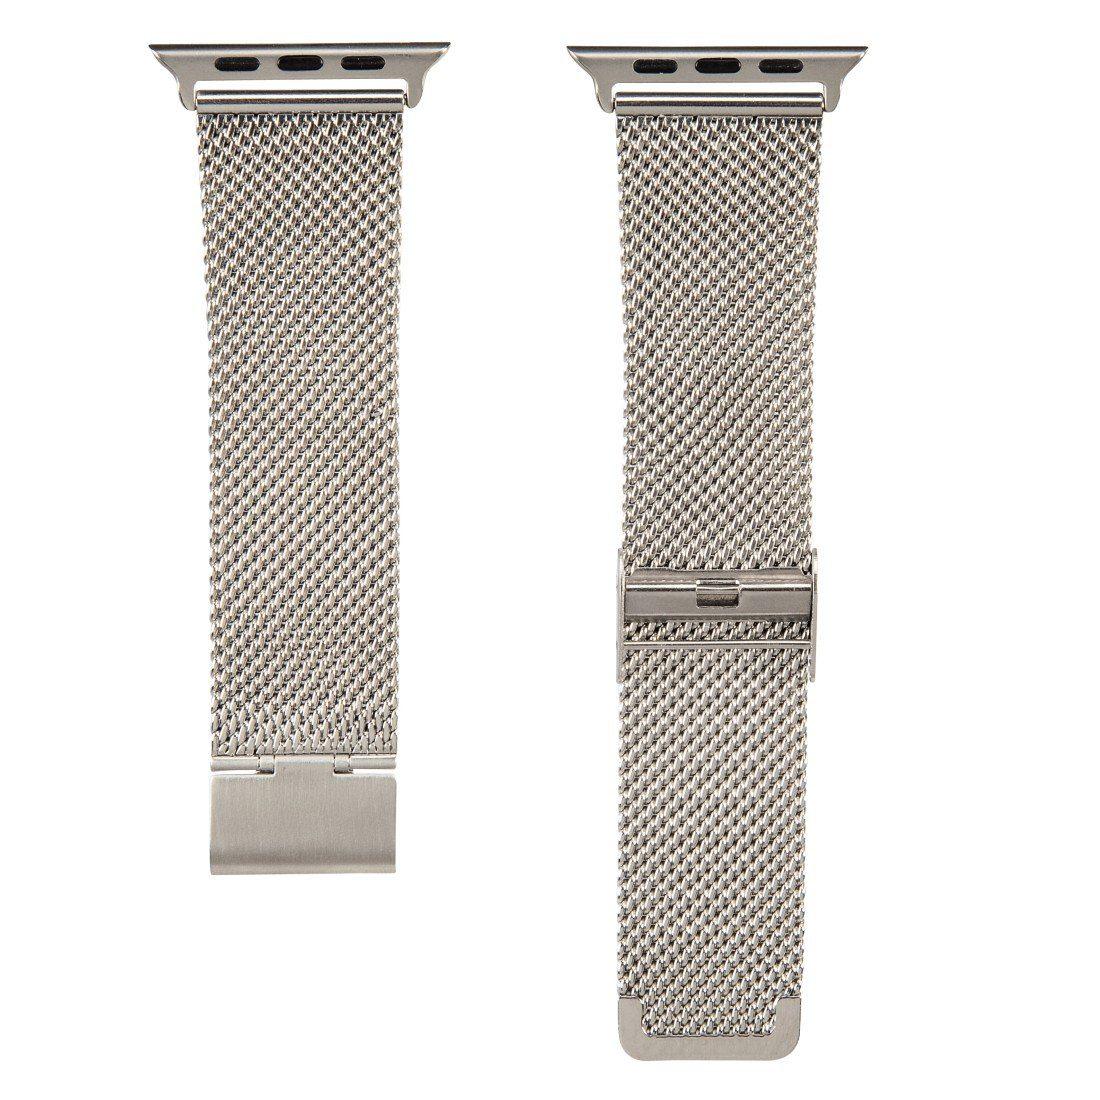 Hama Armband f. Apple Watch 42 mm Uhrenarmband größenverstellbar »Wechselarmband Edelstahl«